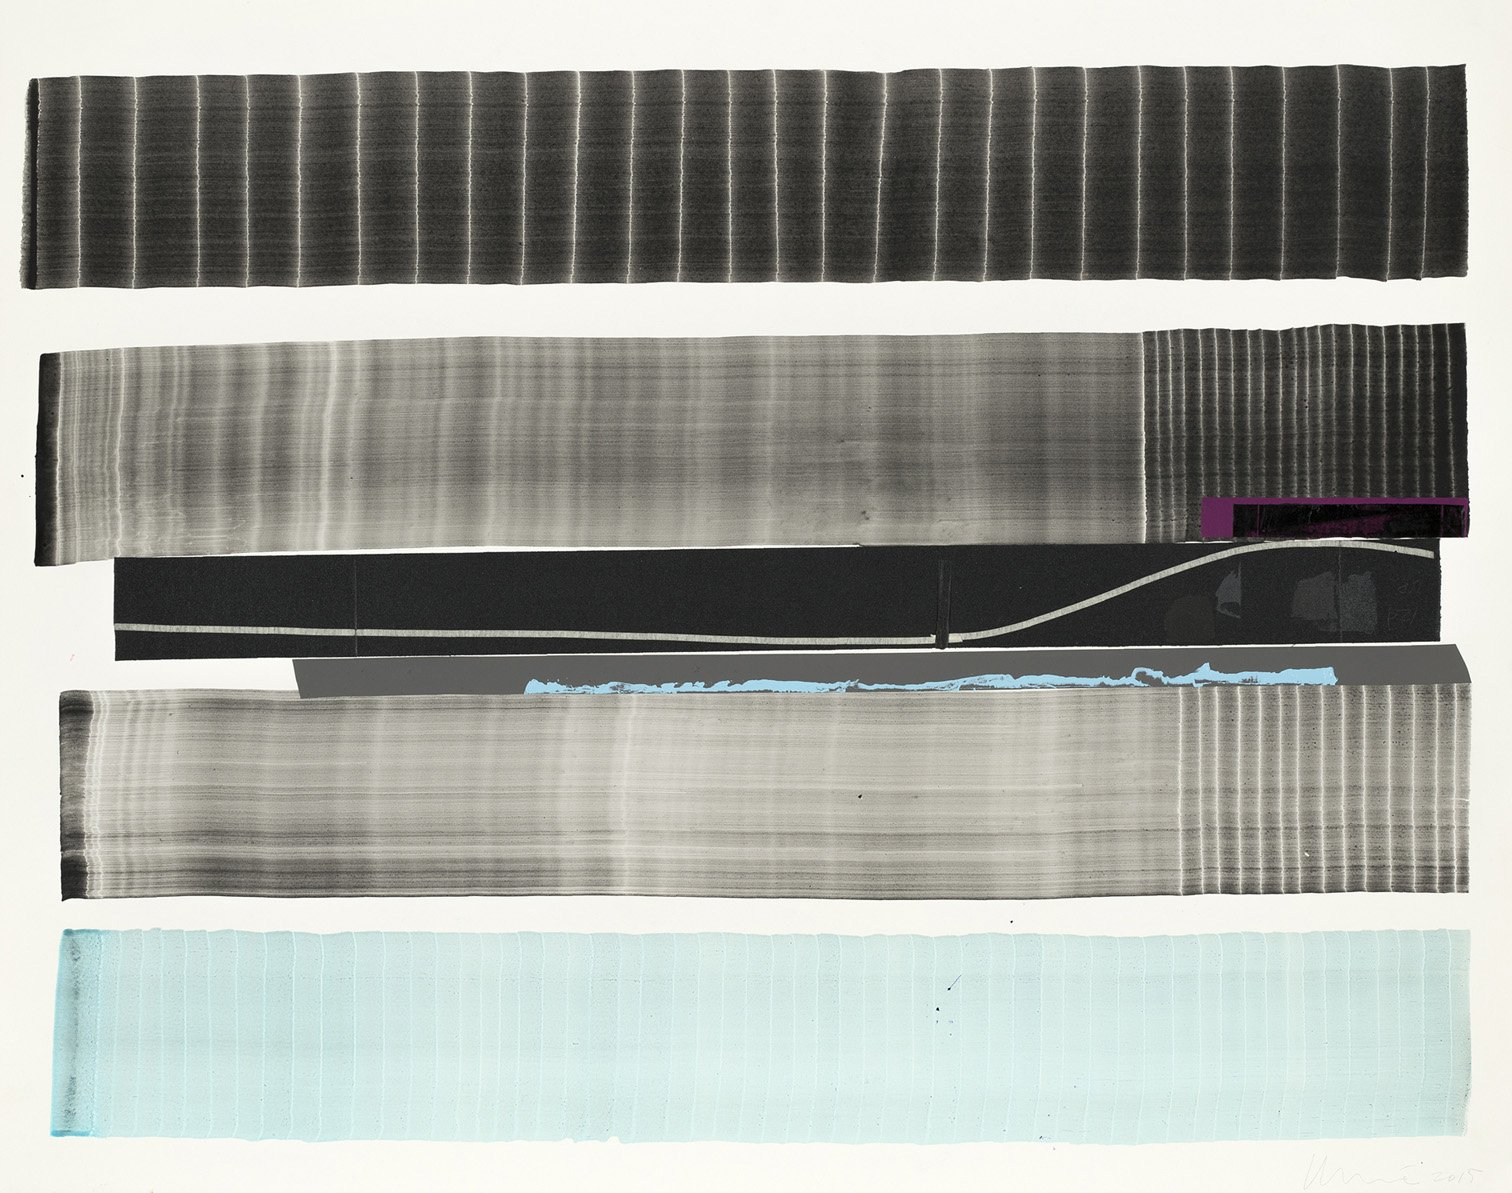 Juan Uslé, Notas para Sone que reveladas (3), 2015, Aquarelle sur papier, 65 x 71 cm, © Juan Uslé Courtesy Galerie Lelong & Co